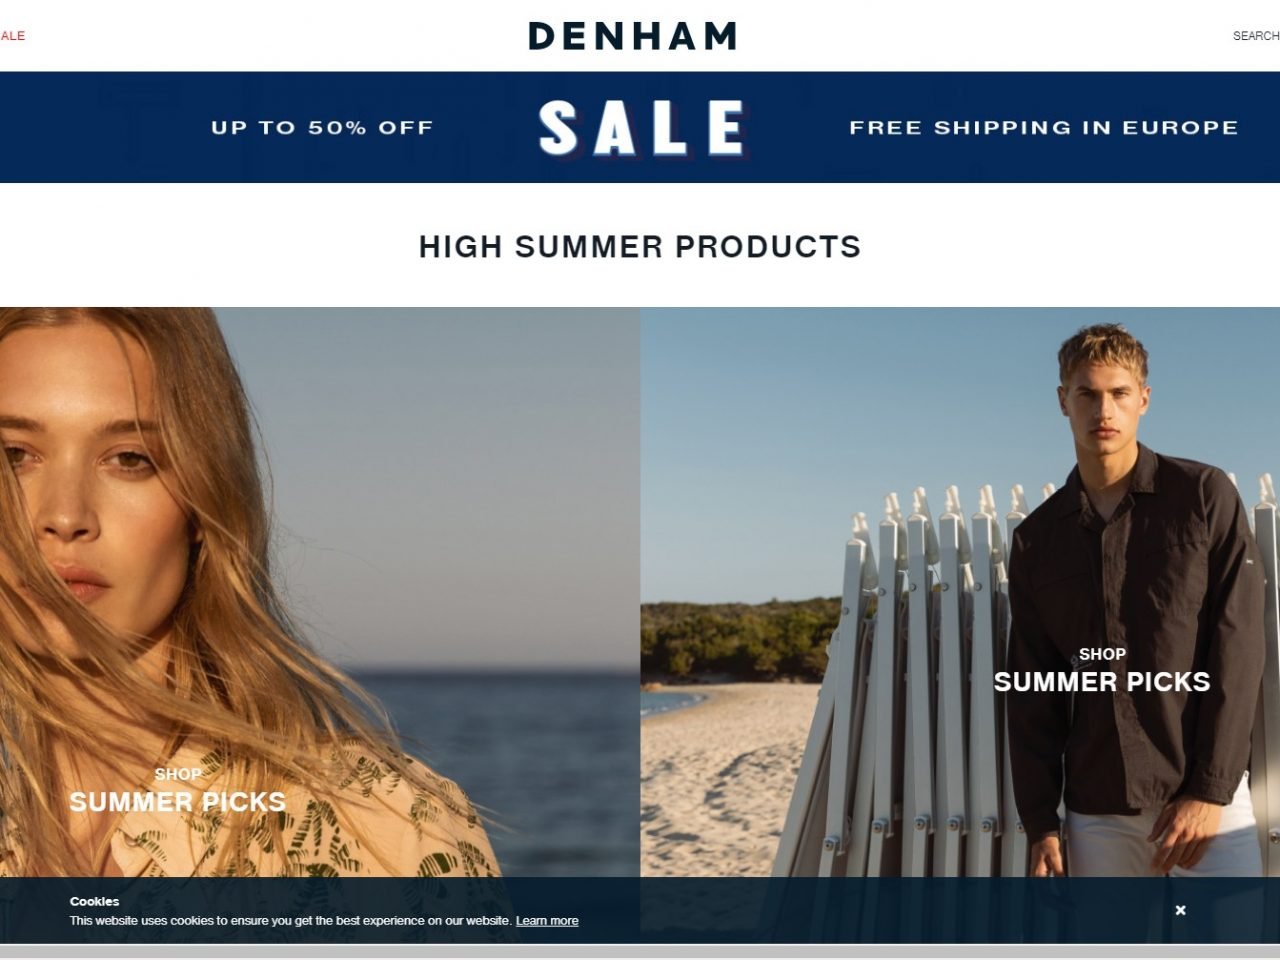 Jeans, t-shirts, sweats and jackets. Hosted by Jason Denham